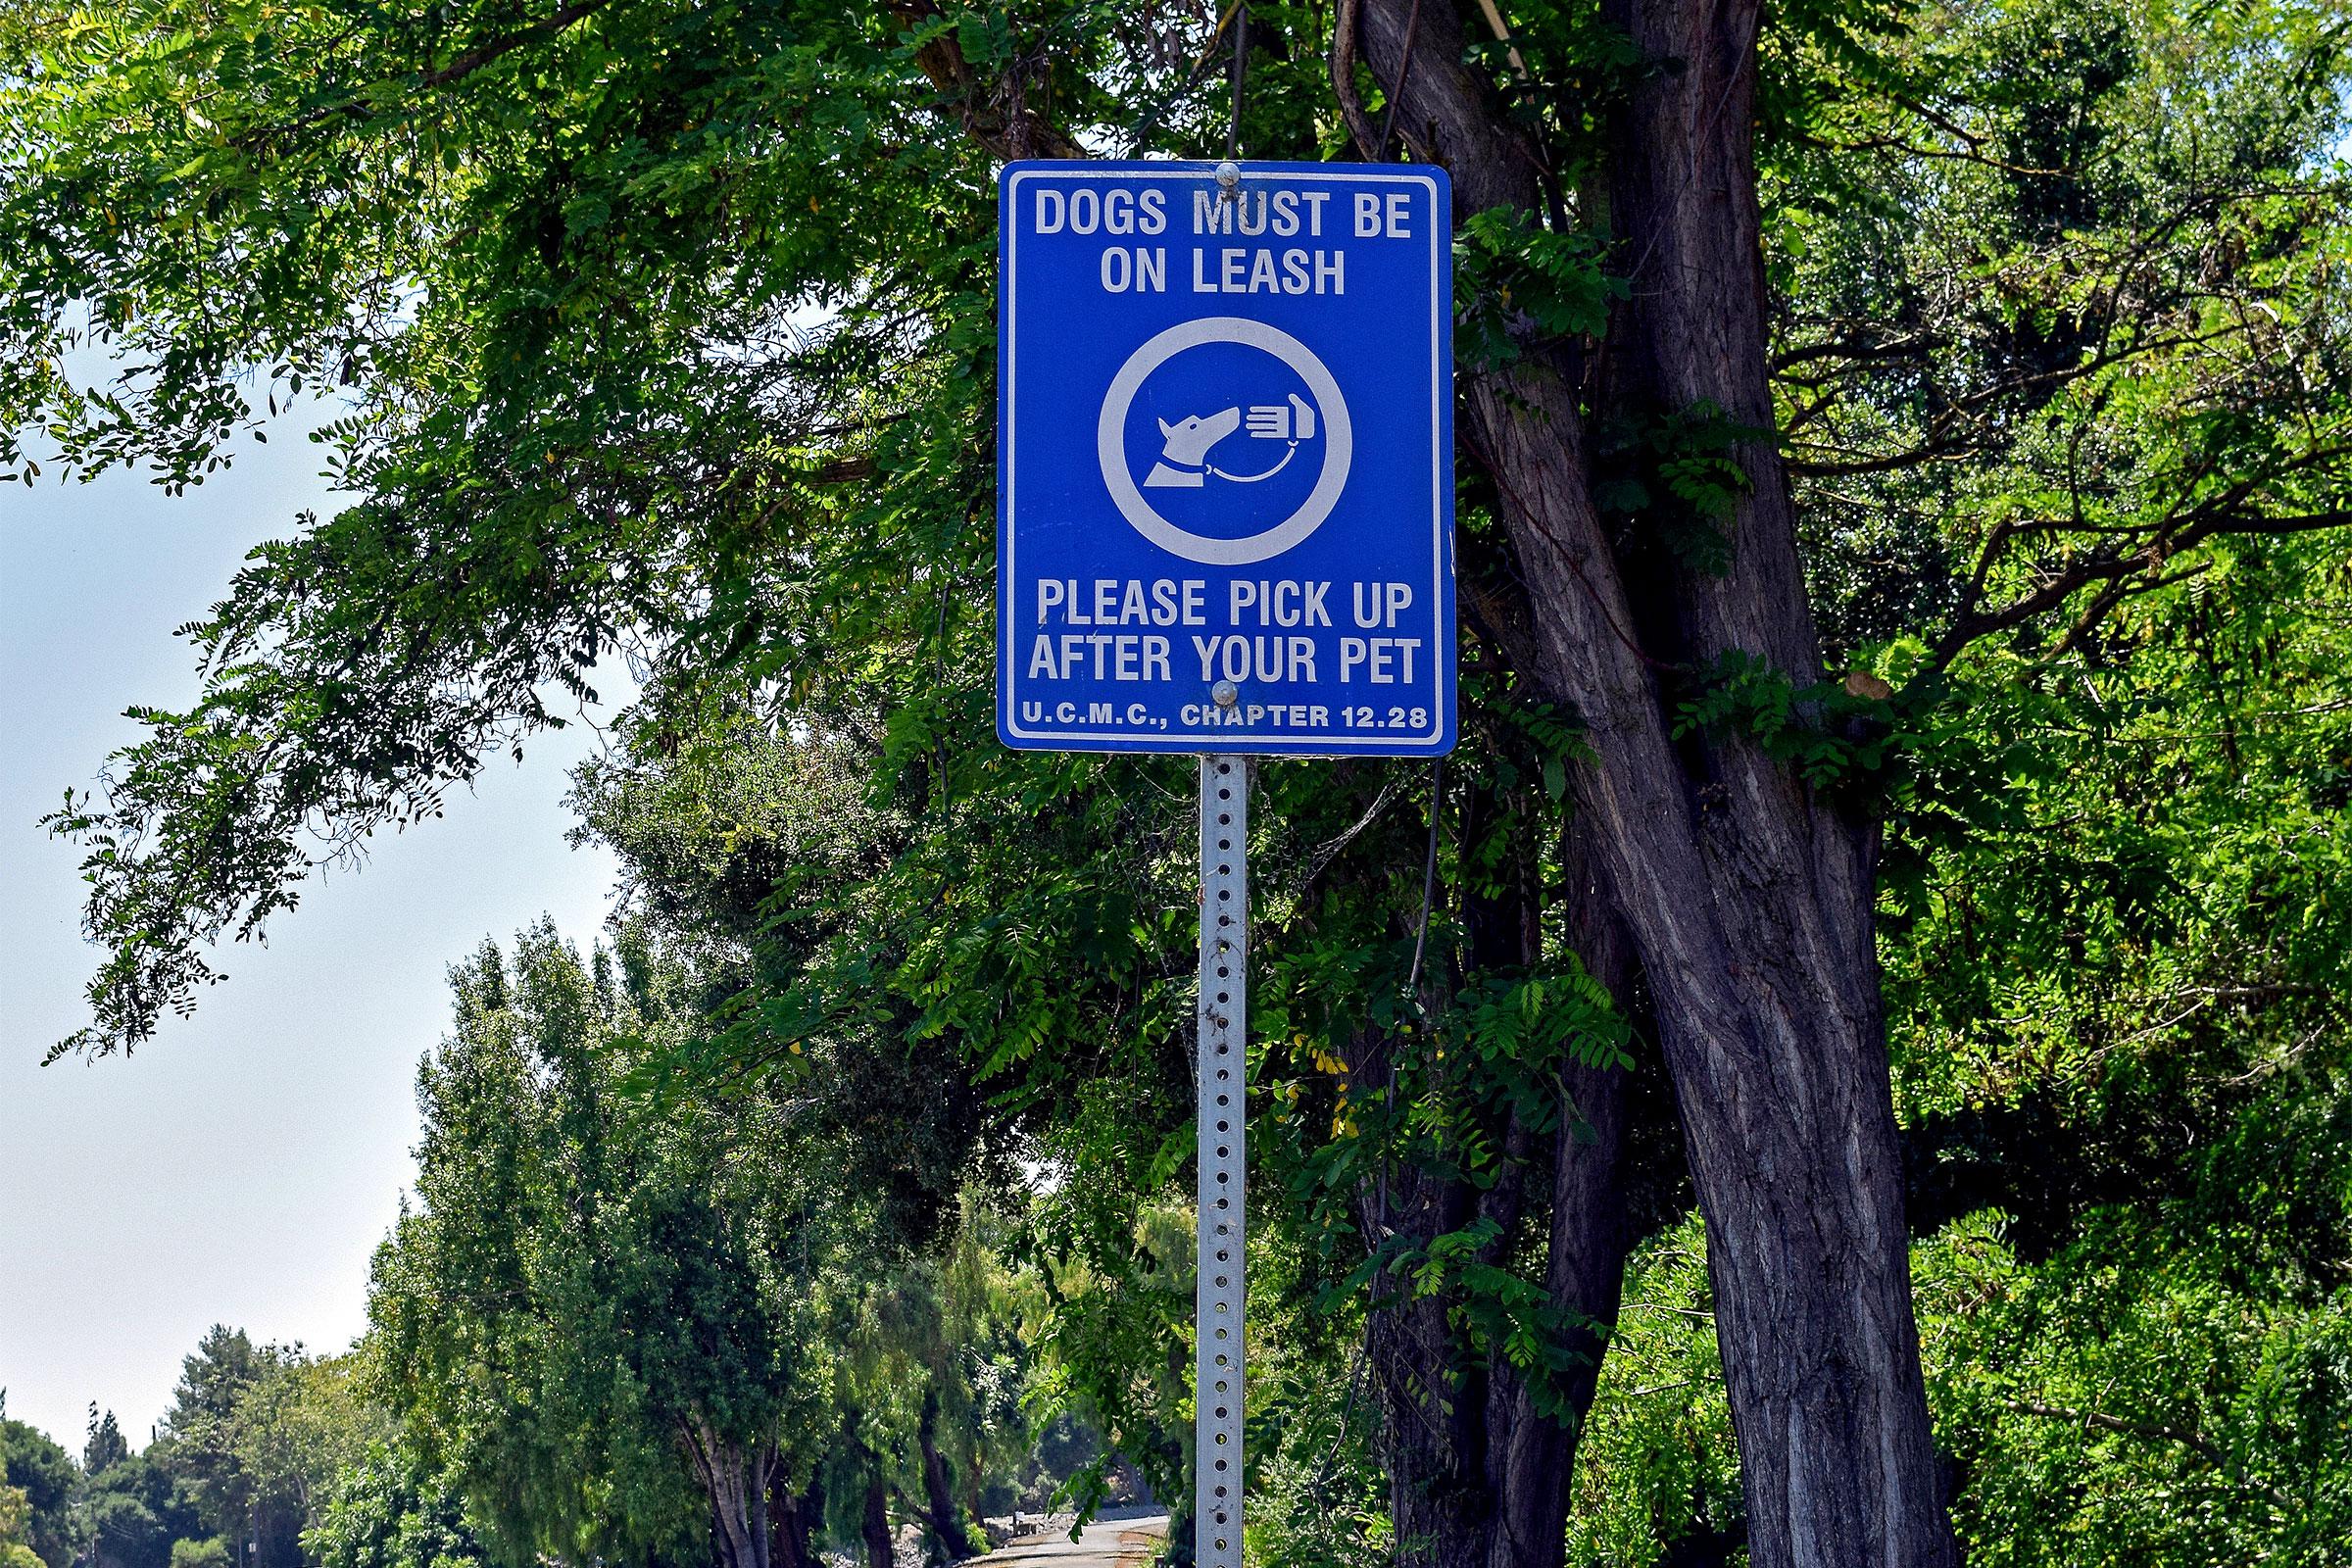 Leash mandate notice in a California park. Robert Clay/Alamy